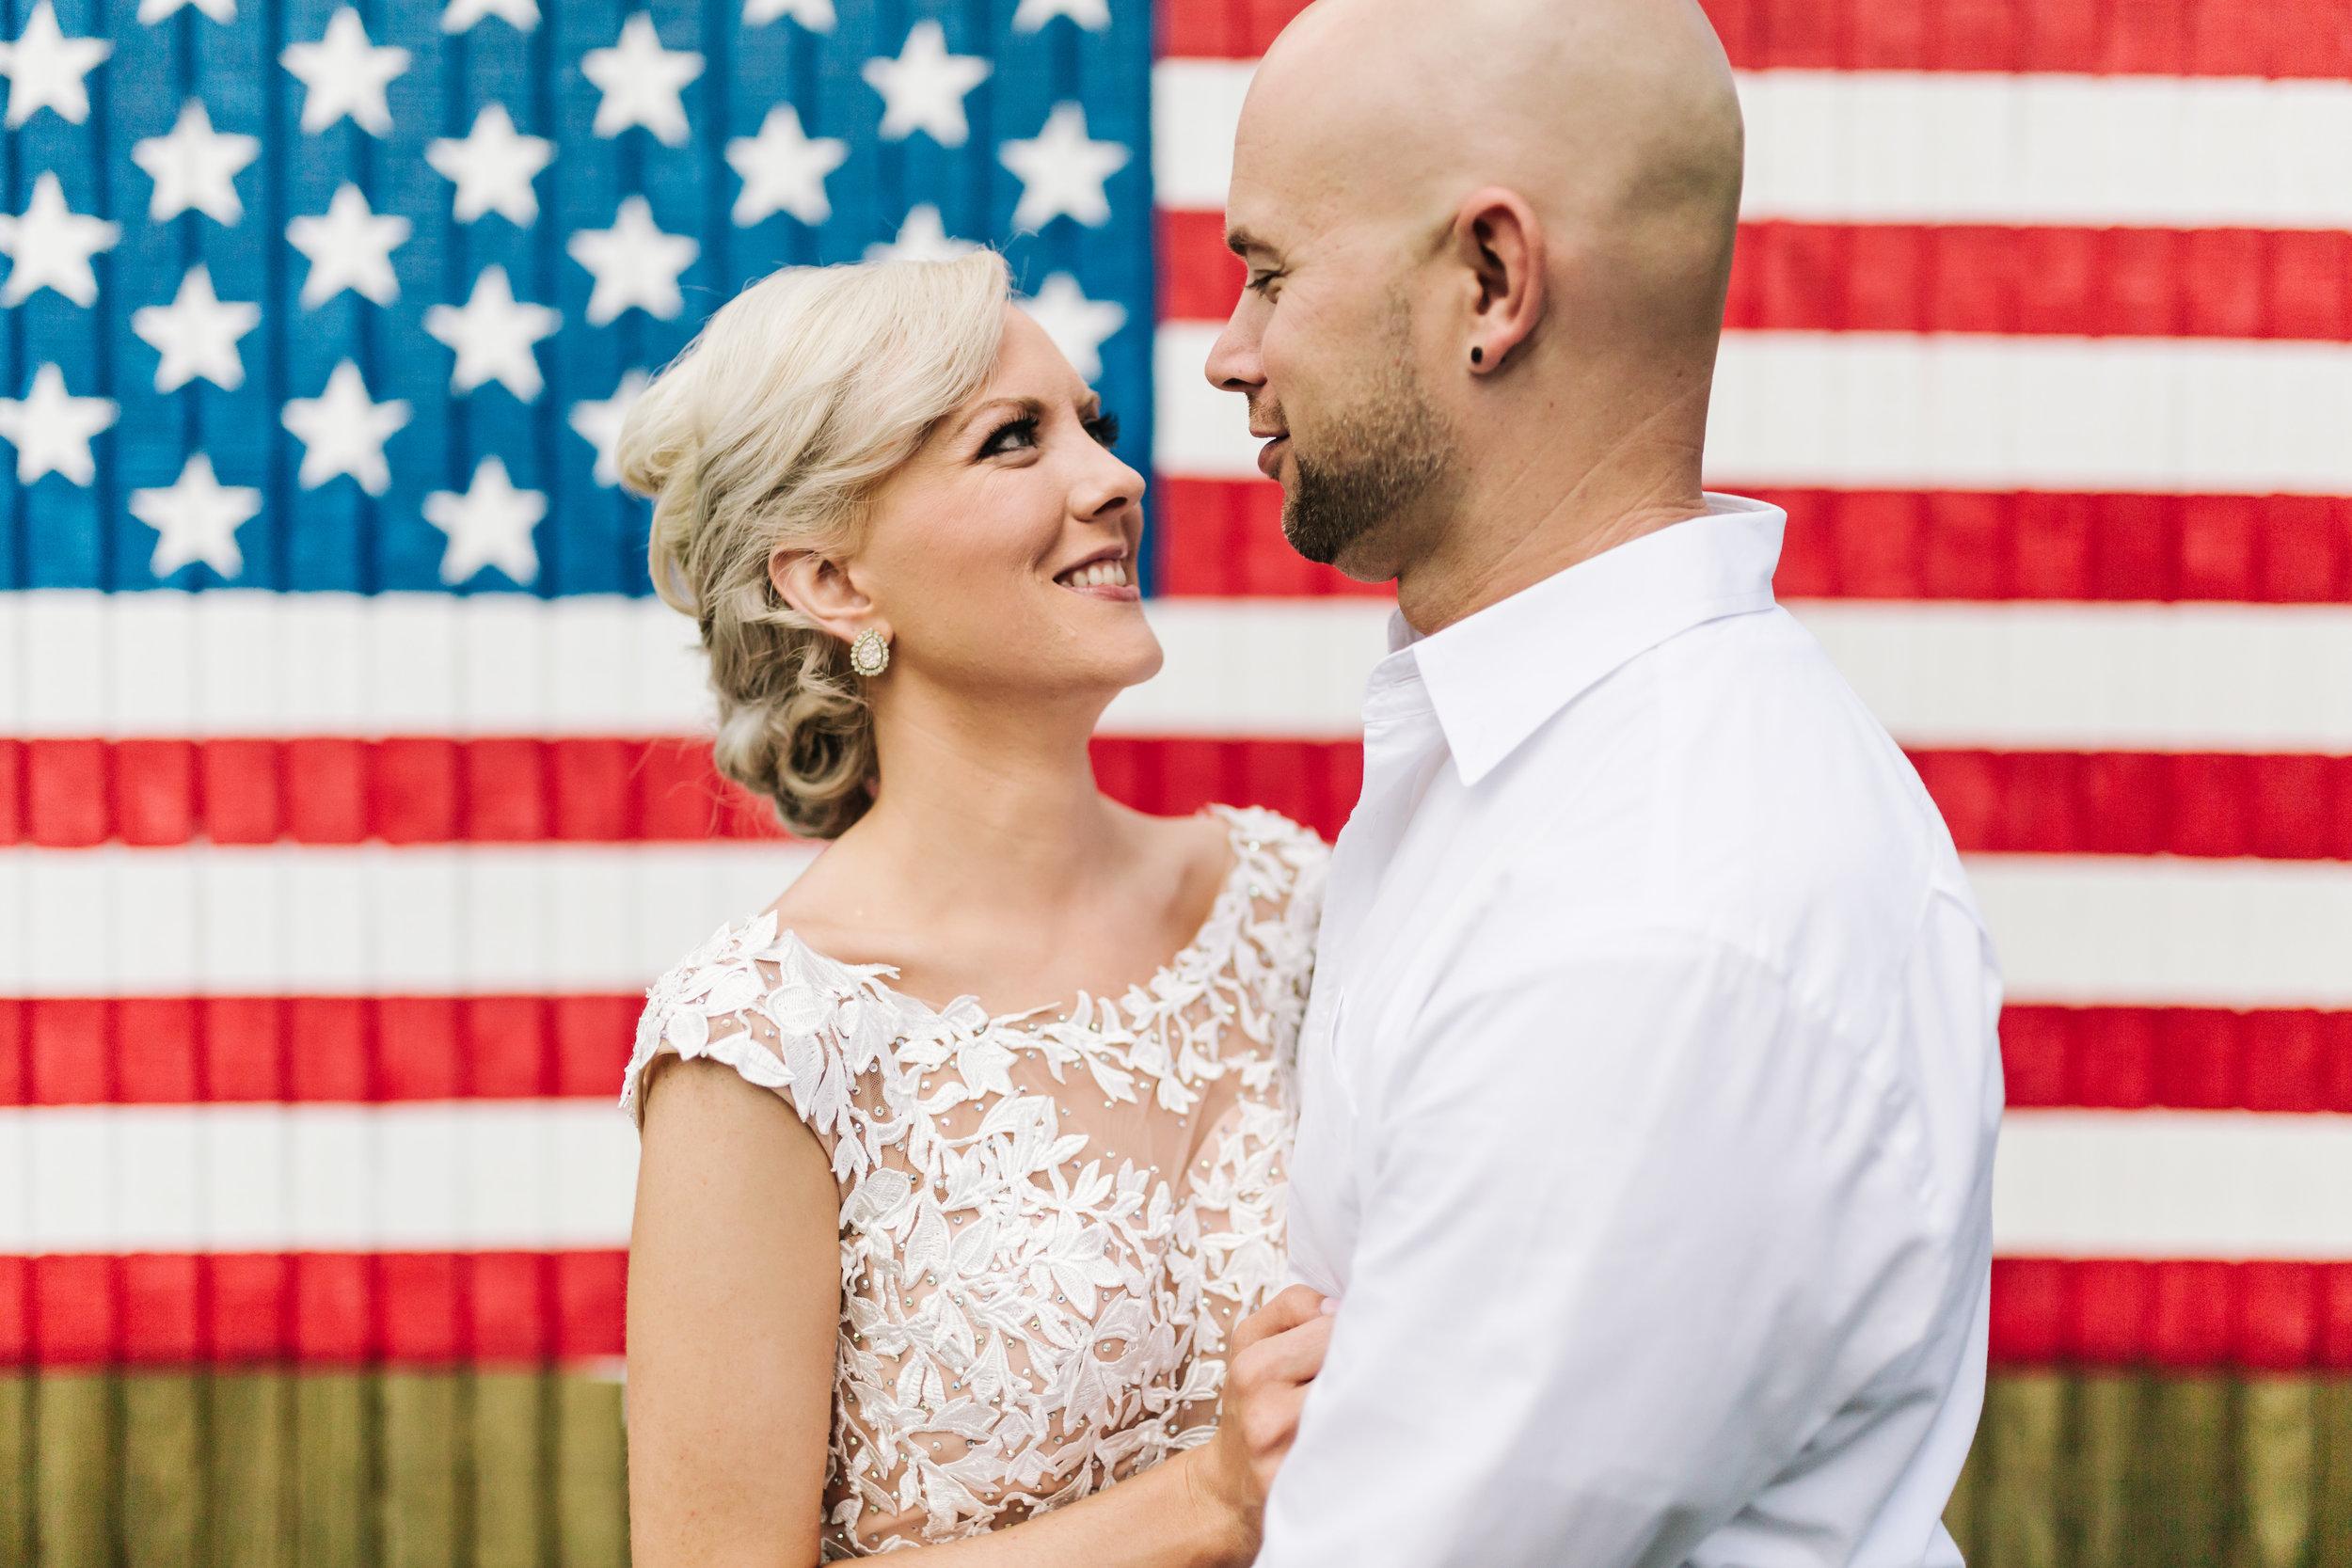 2018.09.02 Ray and Sarah Prizner Nashville TN Wedding FINALS-175.jpg